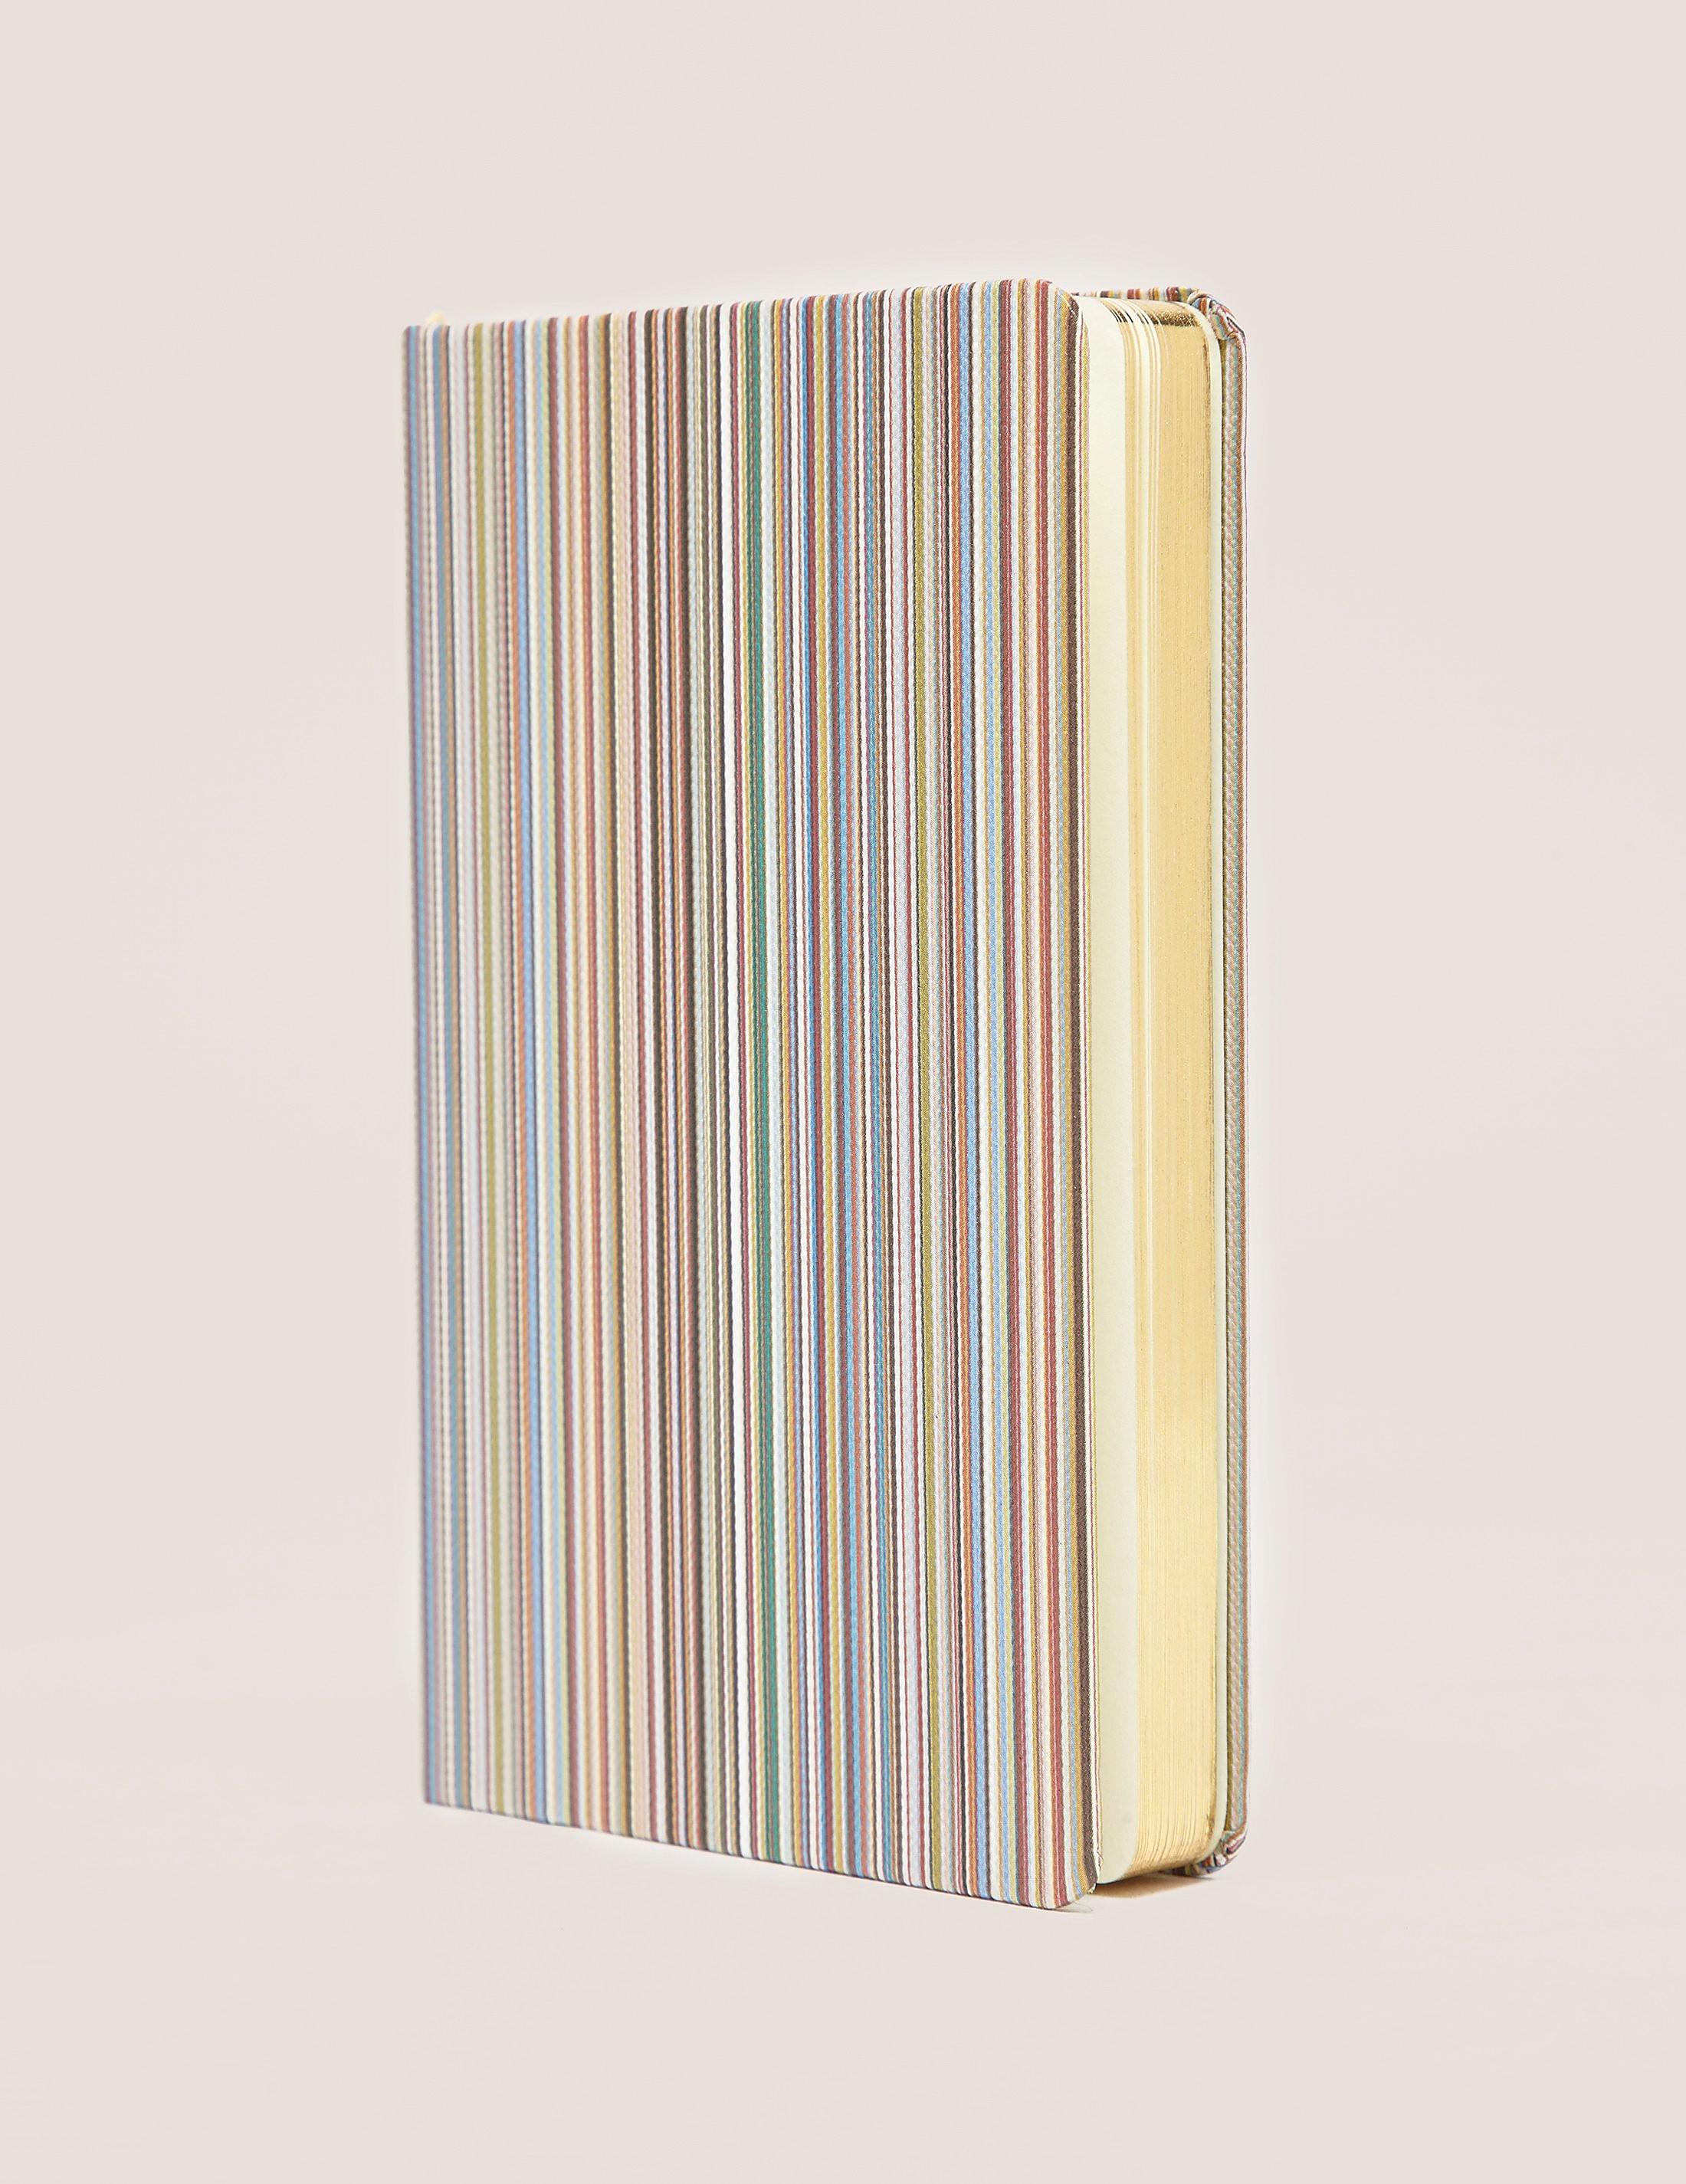 Paul Smith Signature Stripe Small Notebook